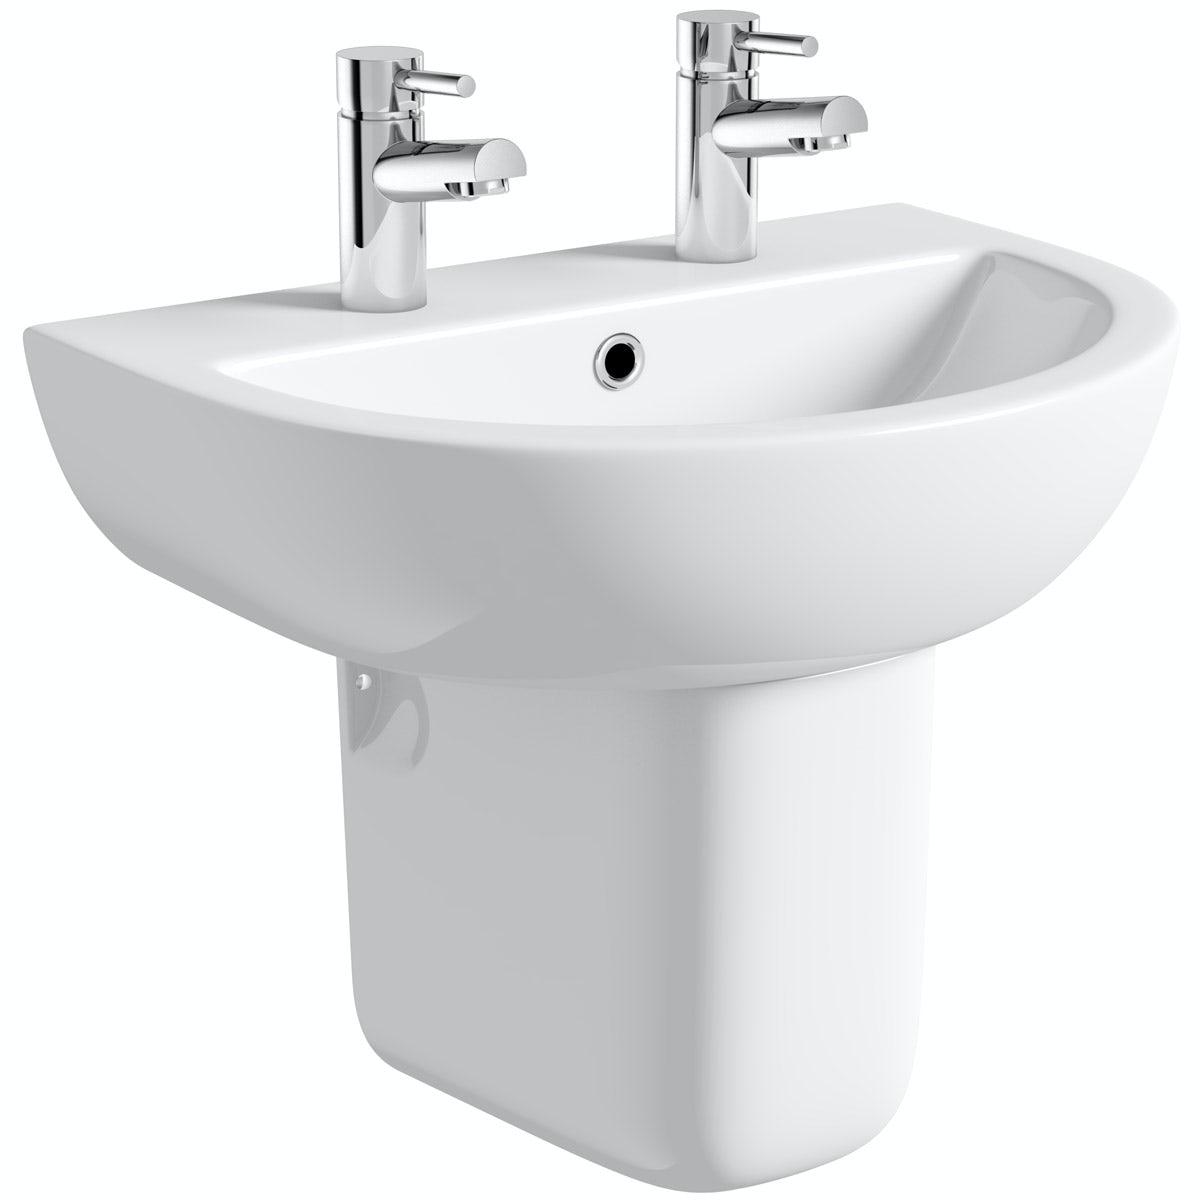 Orchard Elena 2 tap hole semi pedestal basin 550mm